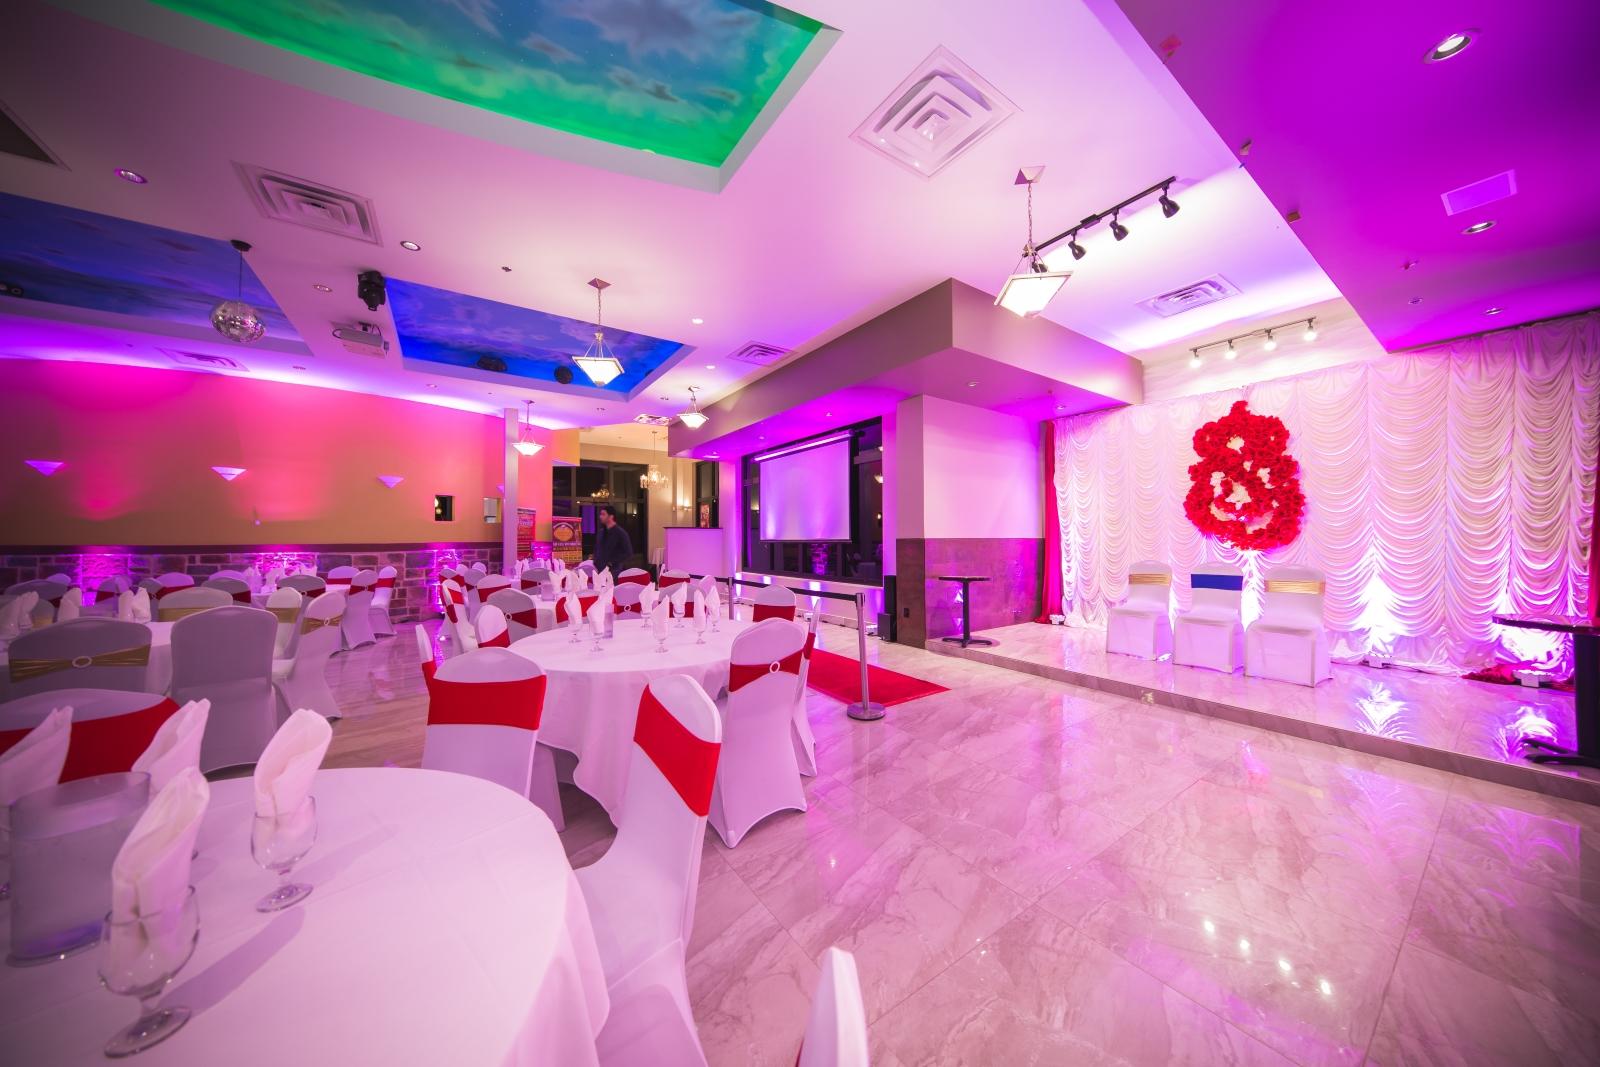 #Bawarchi Banquet# - #Services#